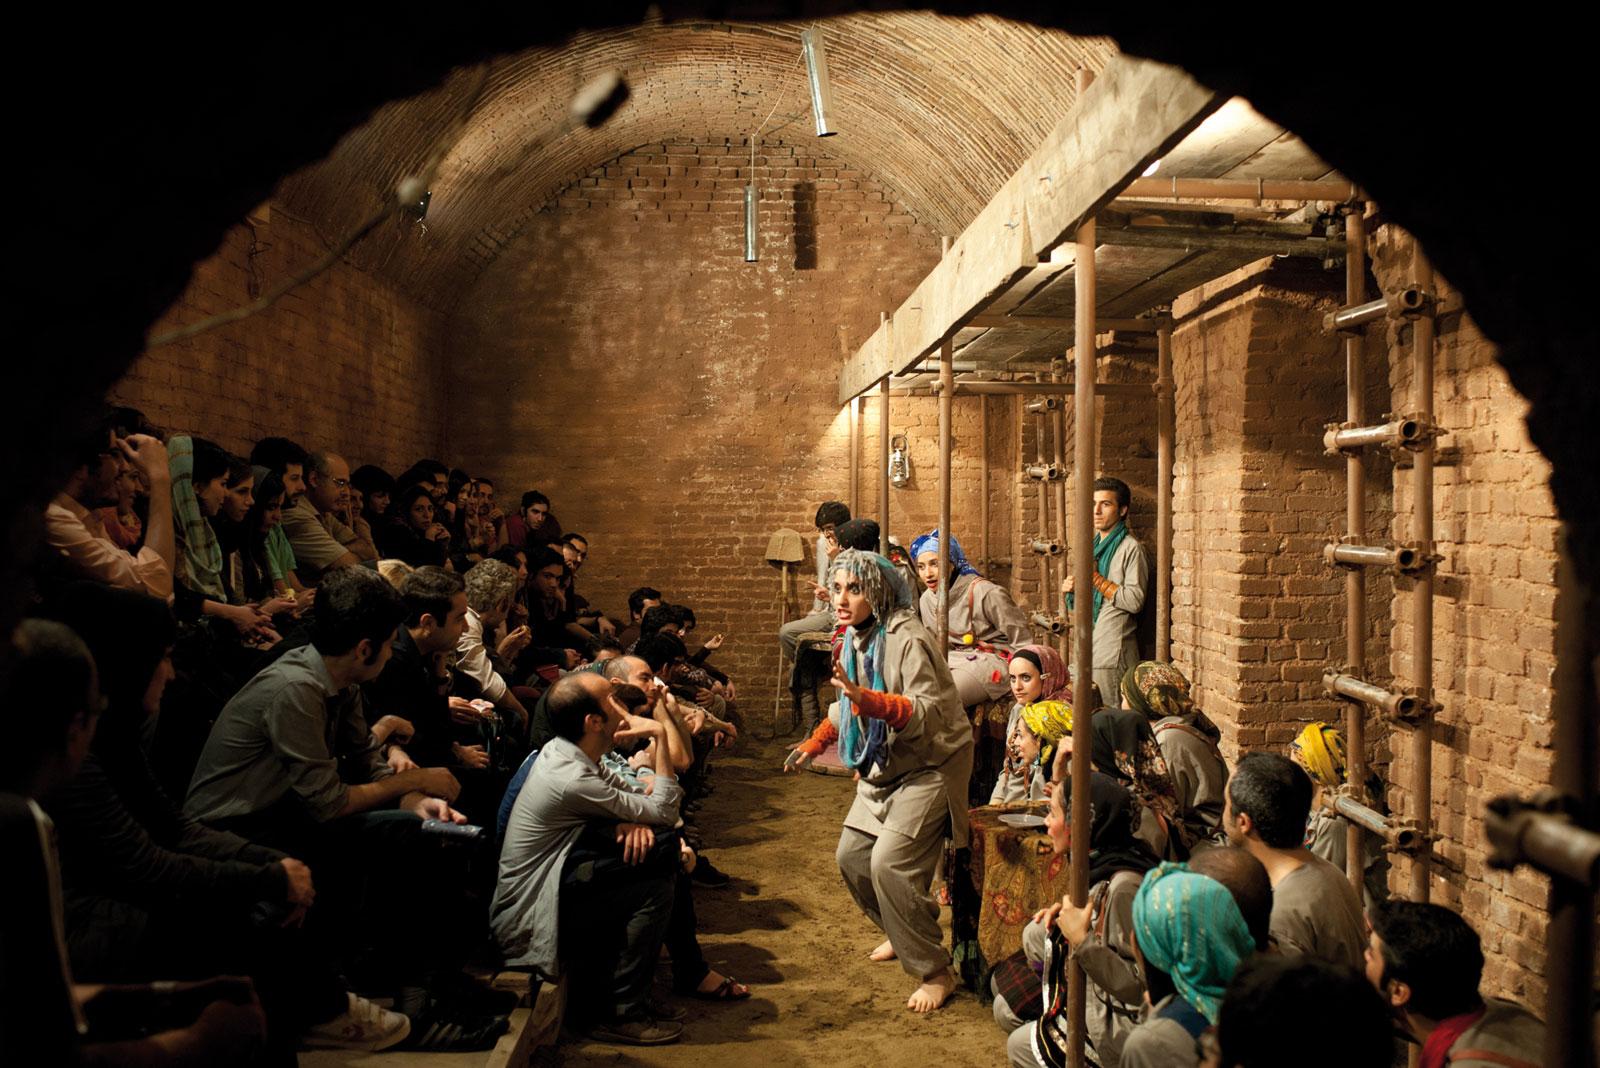 Téhéran - Insolence underground